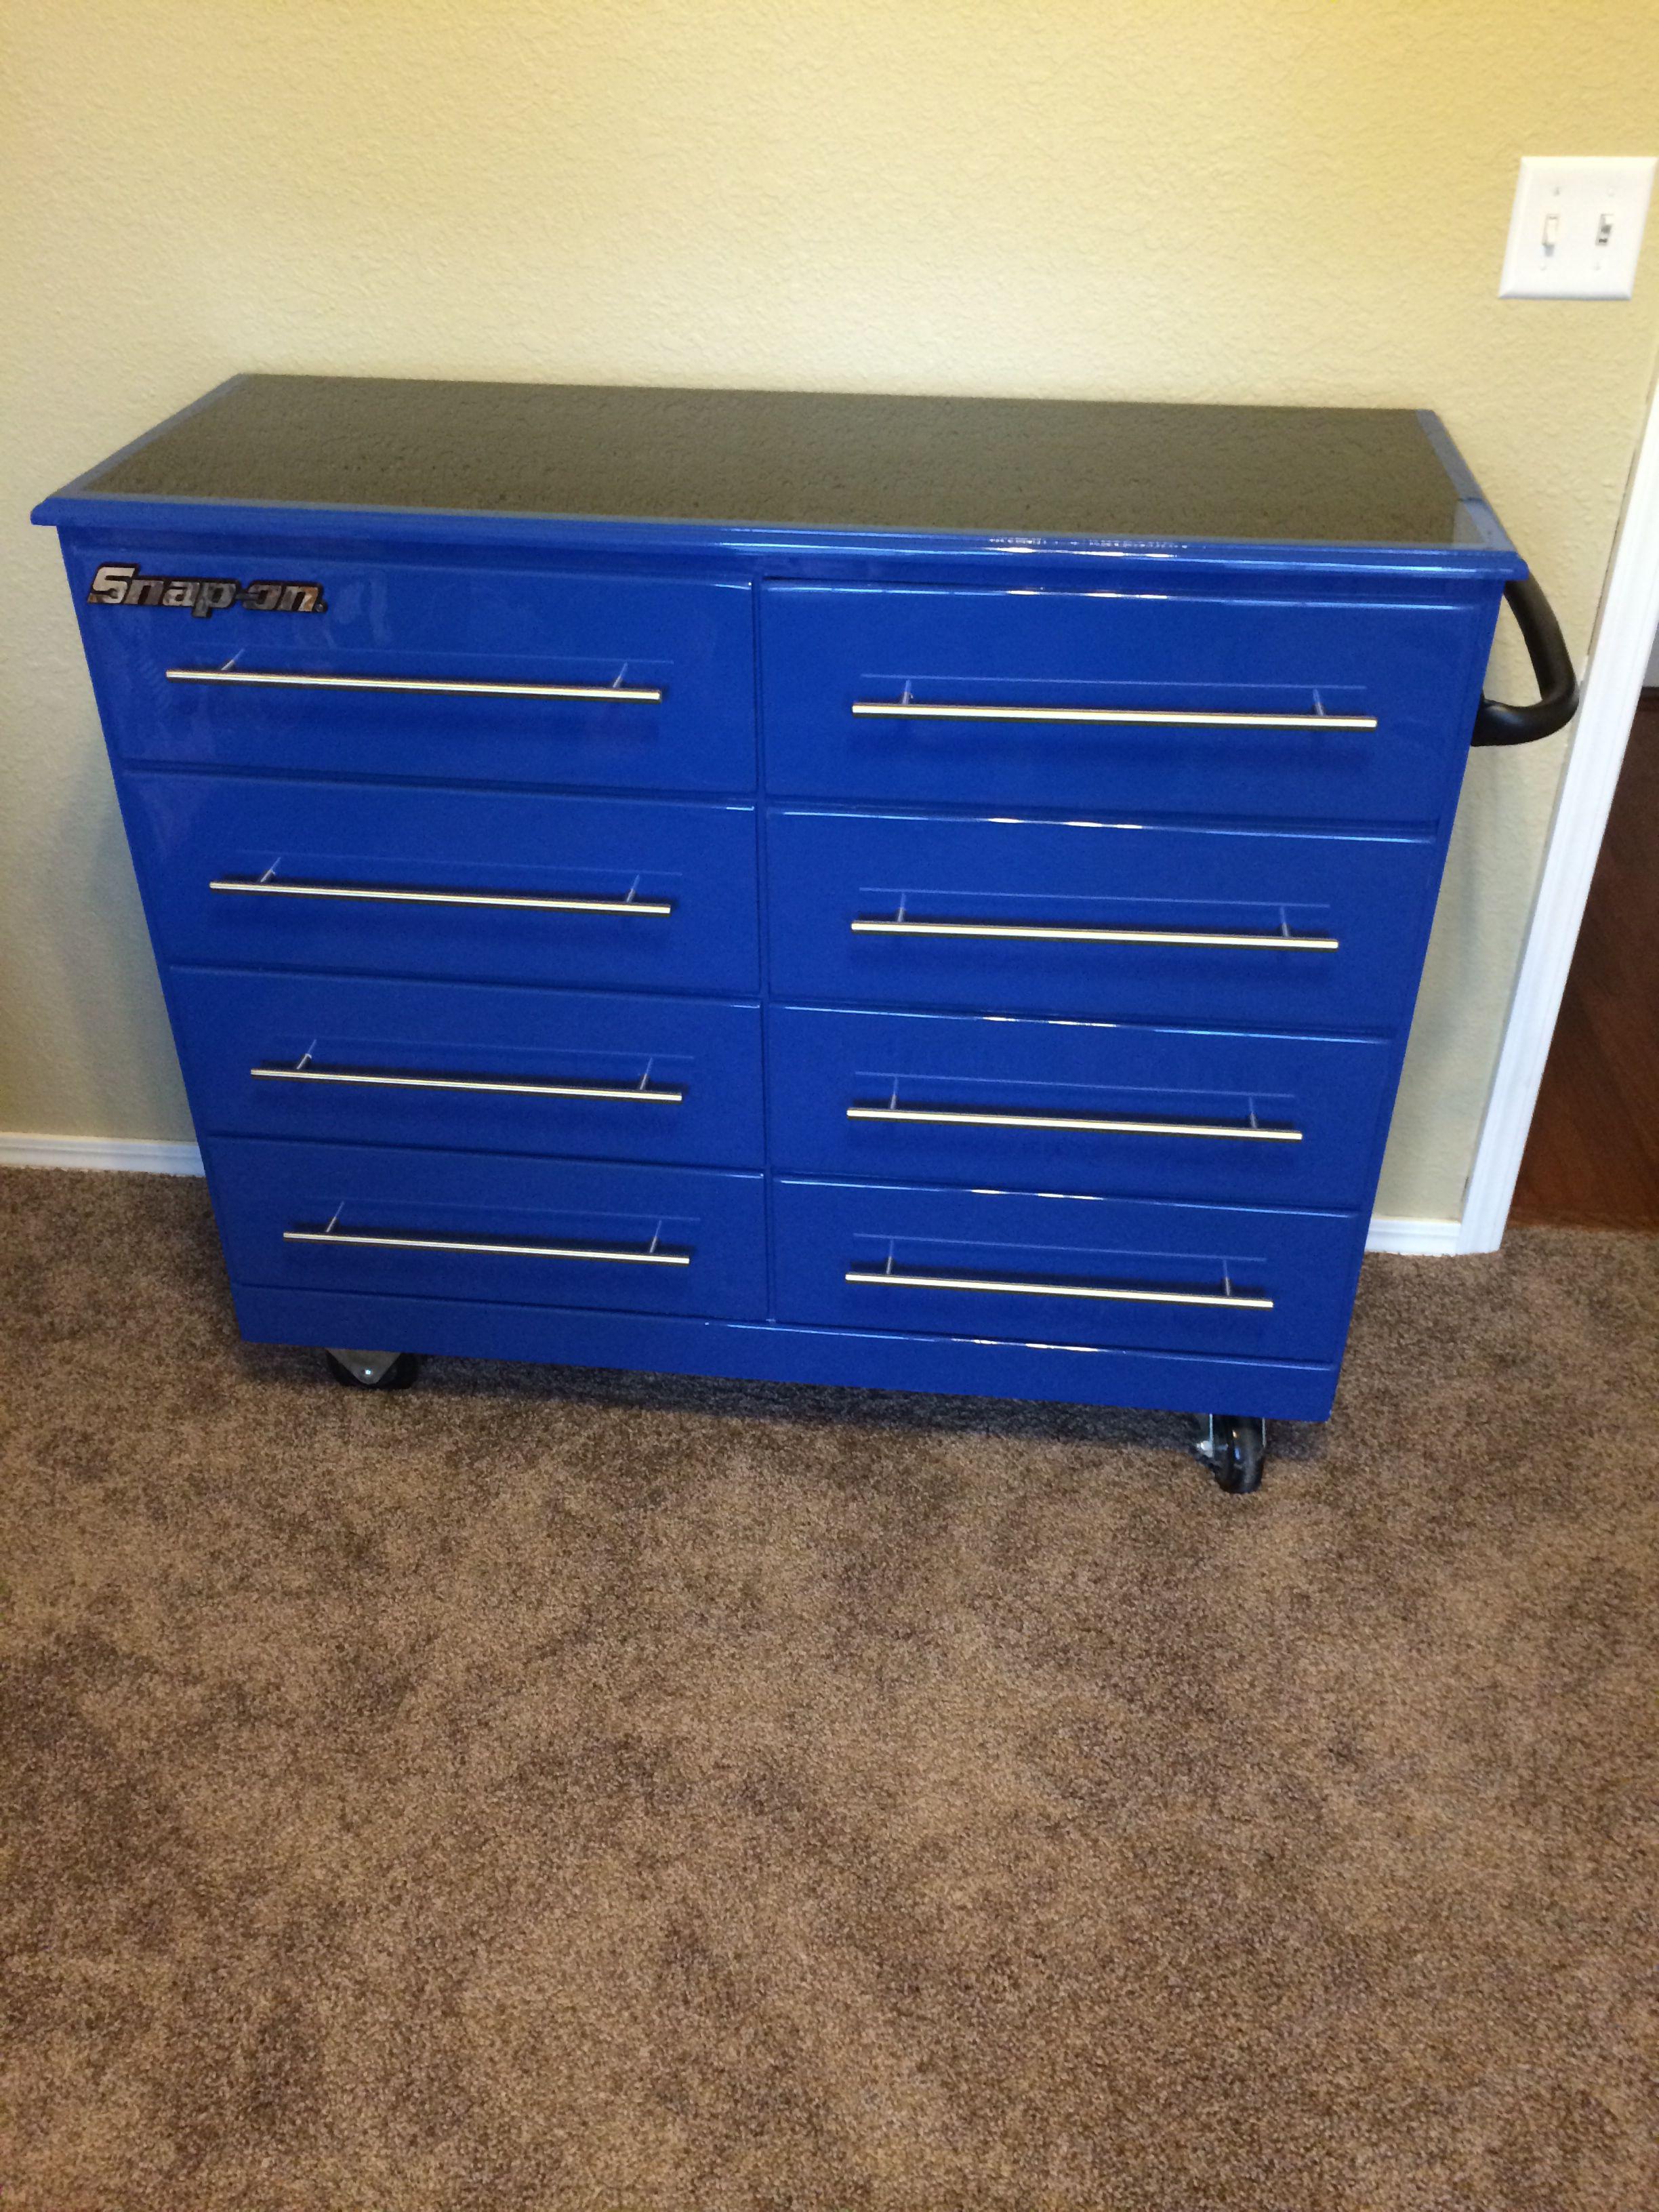 Tool Chest Dresser Makeover: Restored Wooden Dresser To A SnapOn Toolbox Dresser For